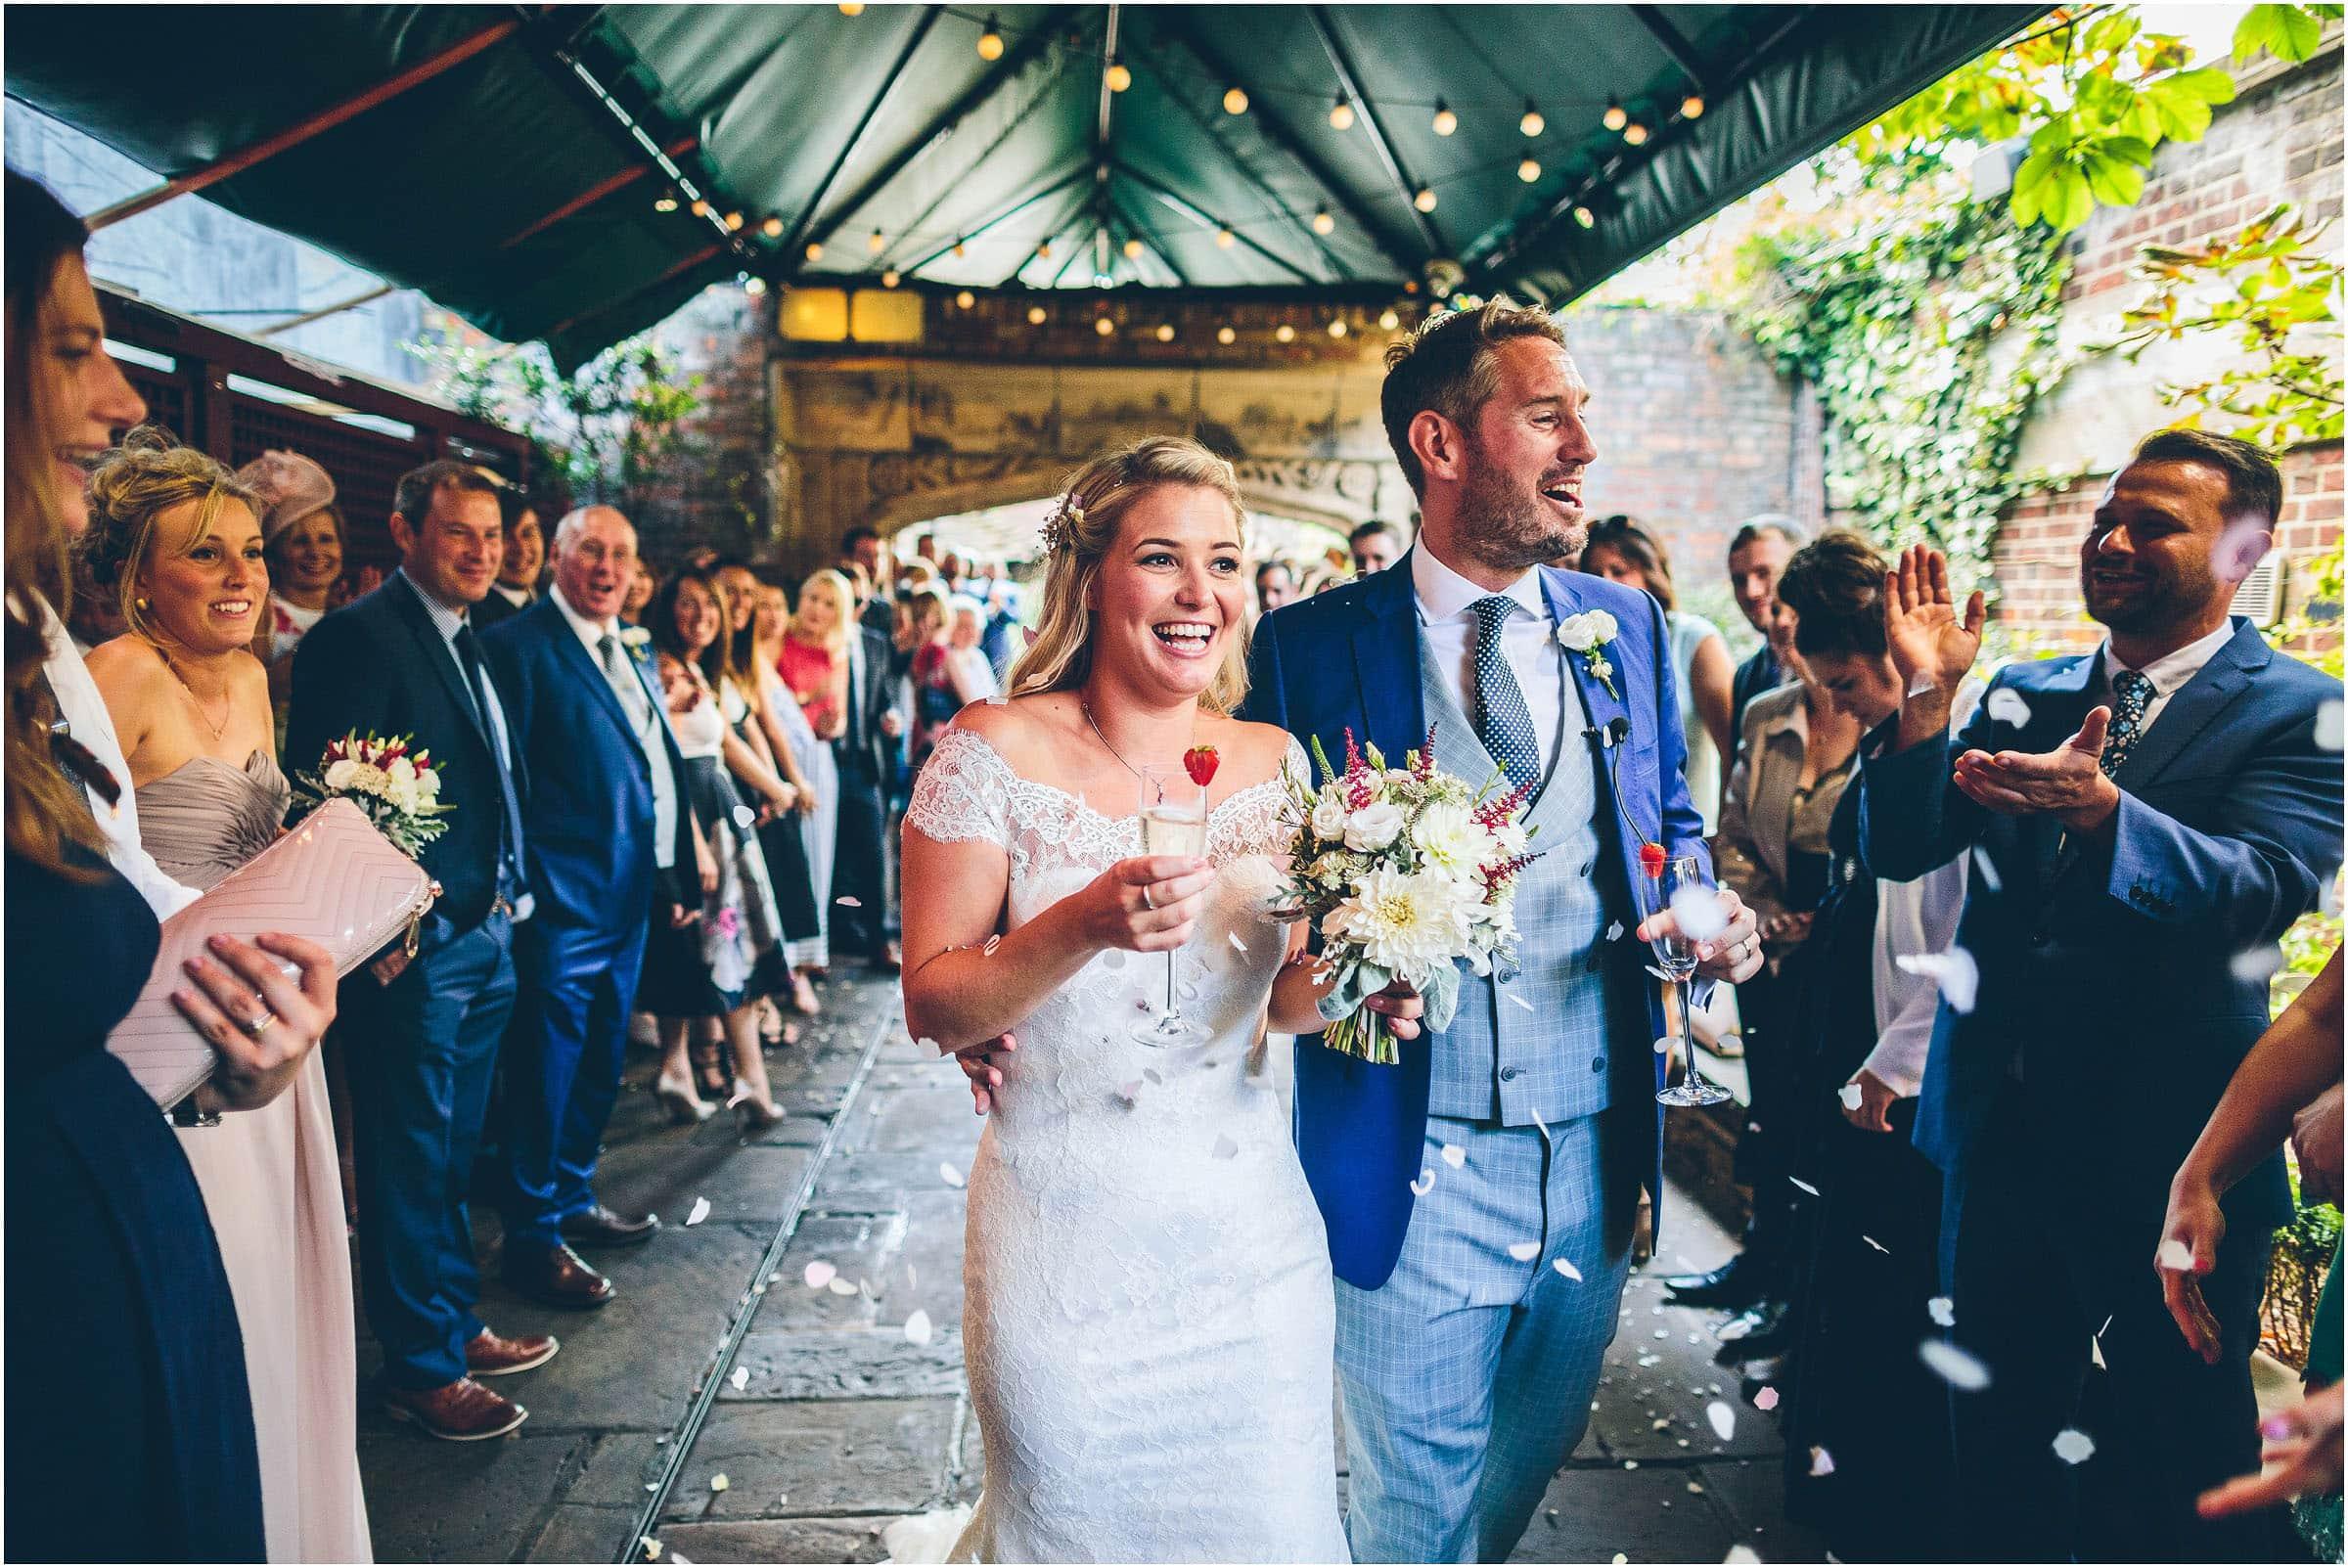 Kensington_Roof_Gardens_Wedding_Photography_0043